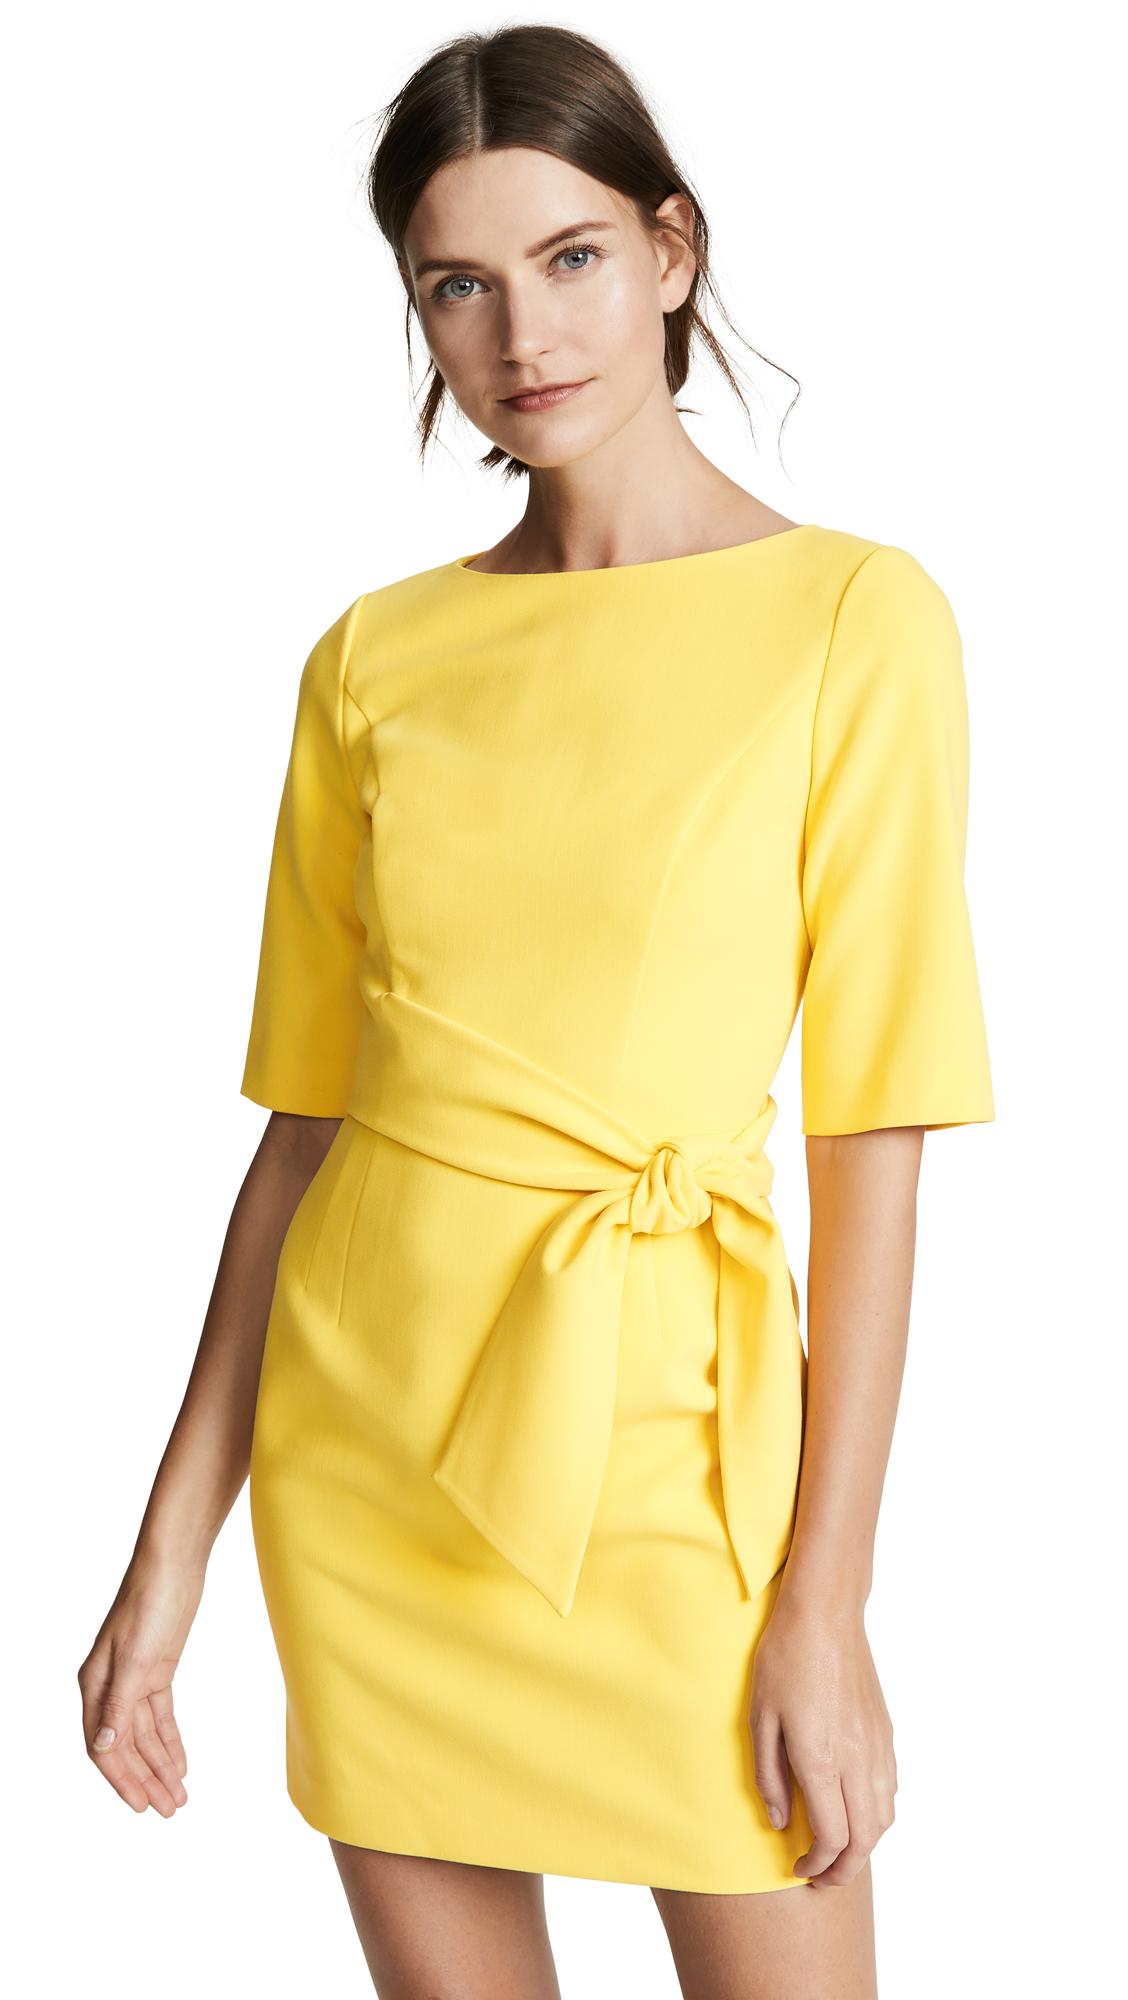 alice + olivia Virgil Boat Neck Dress - Canary